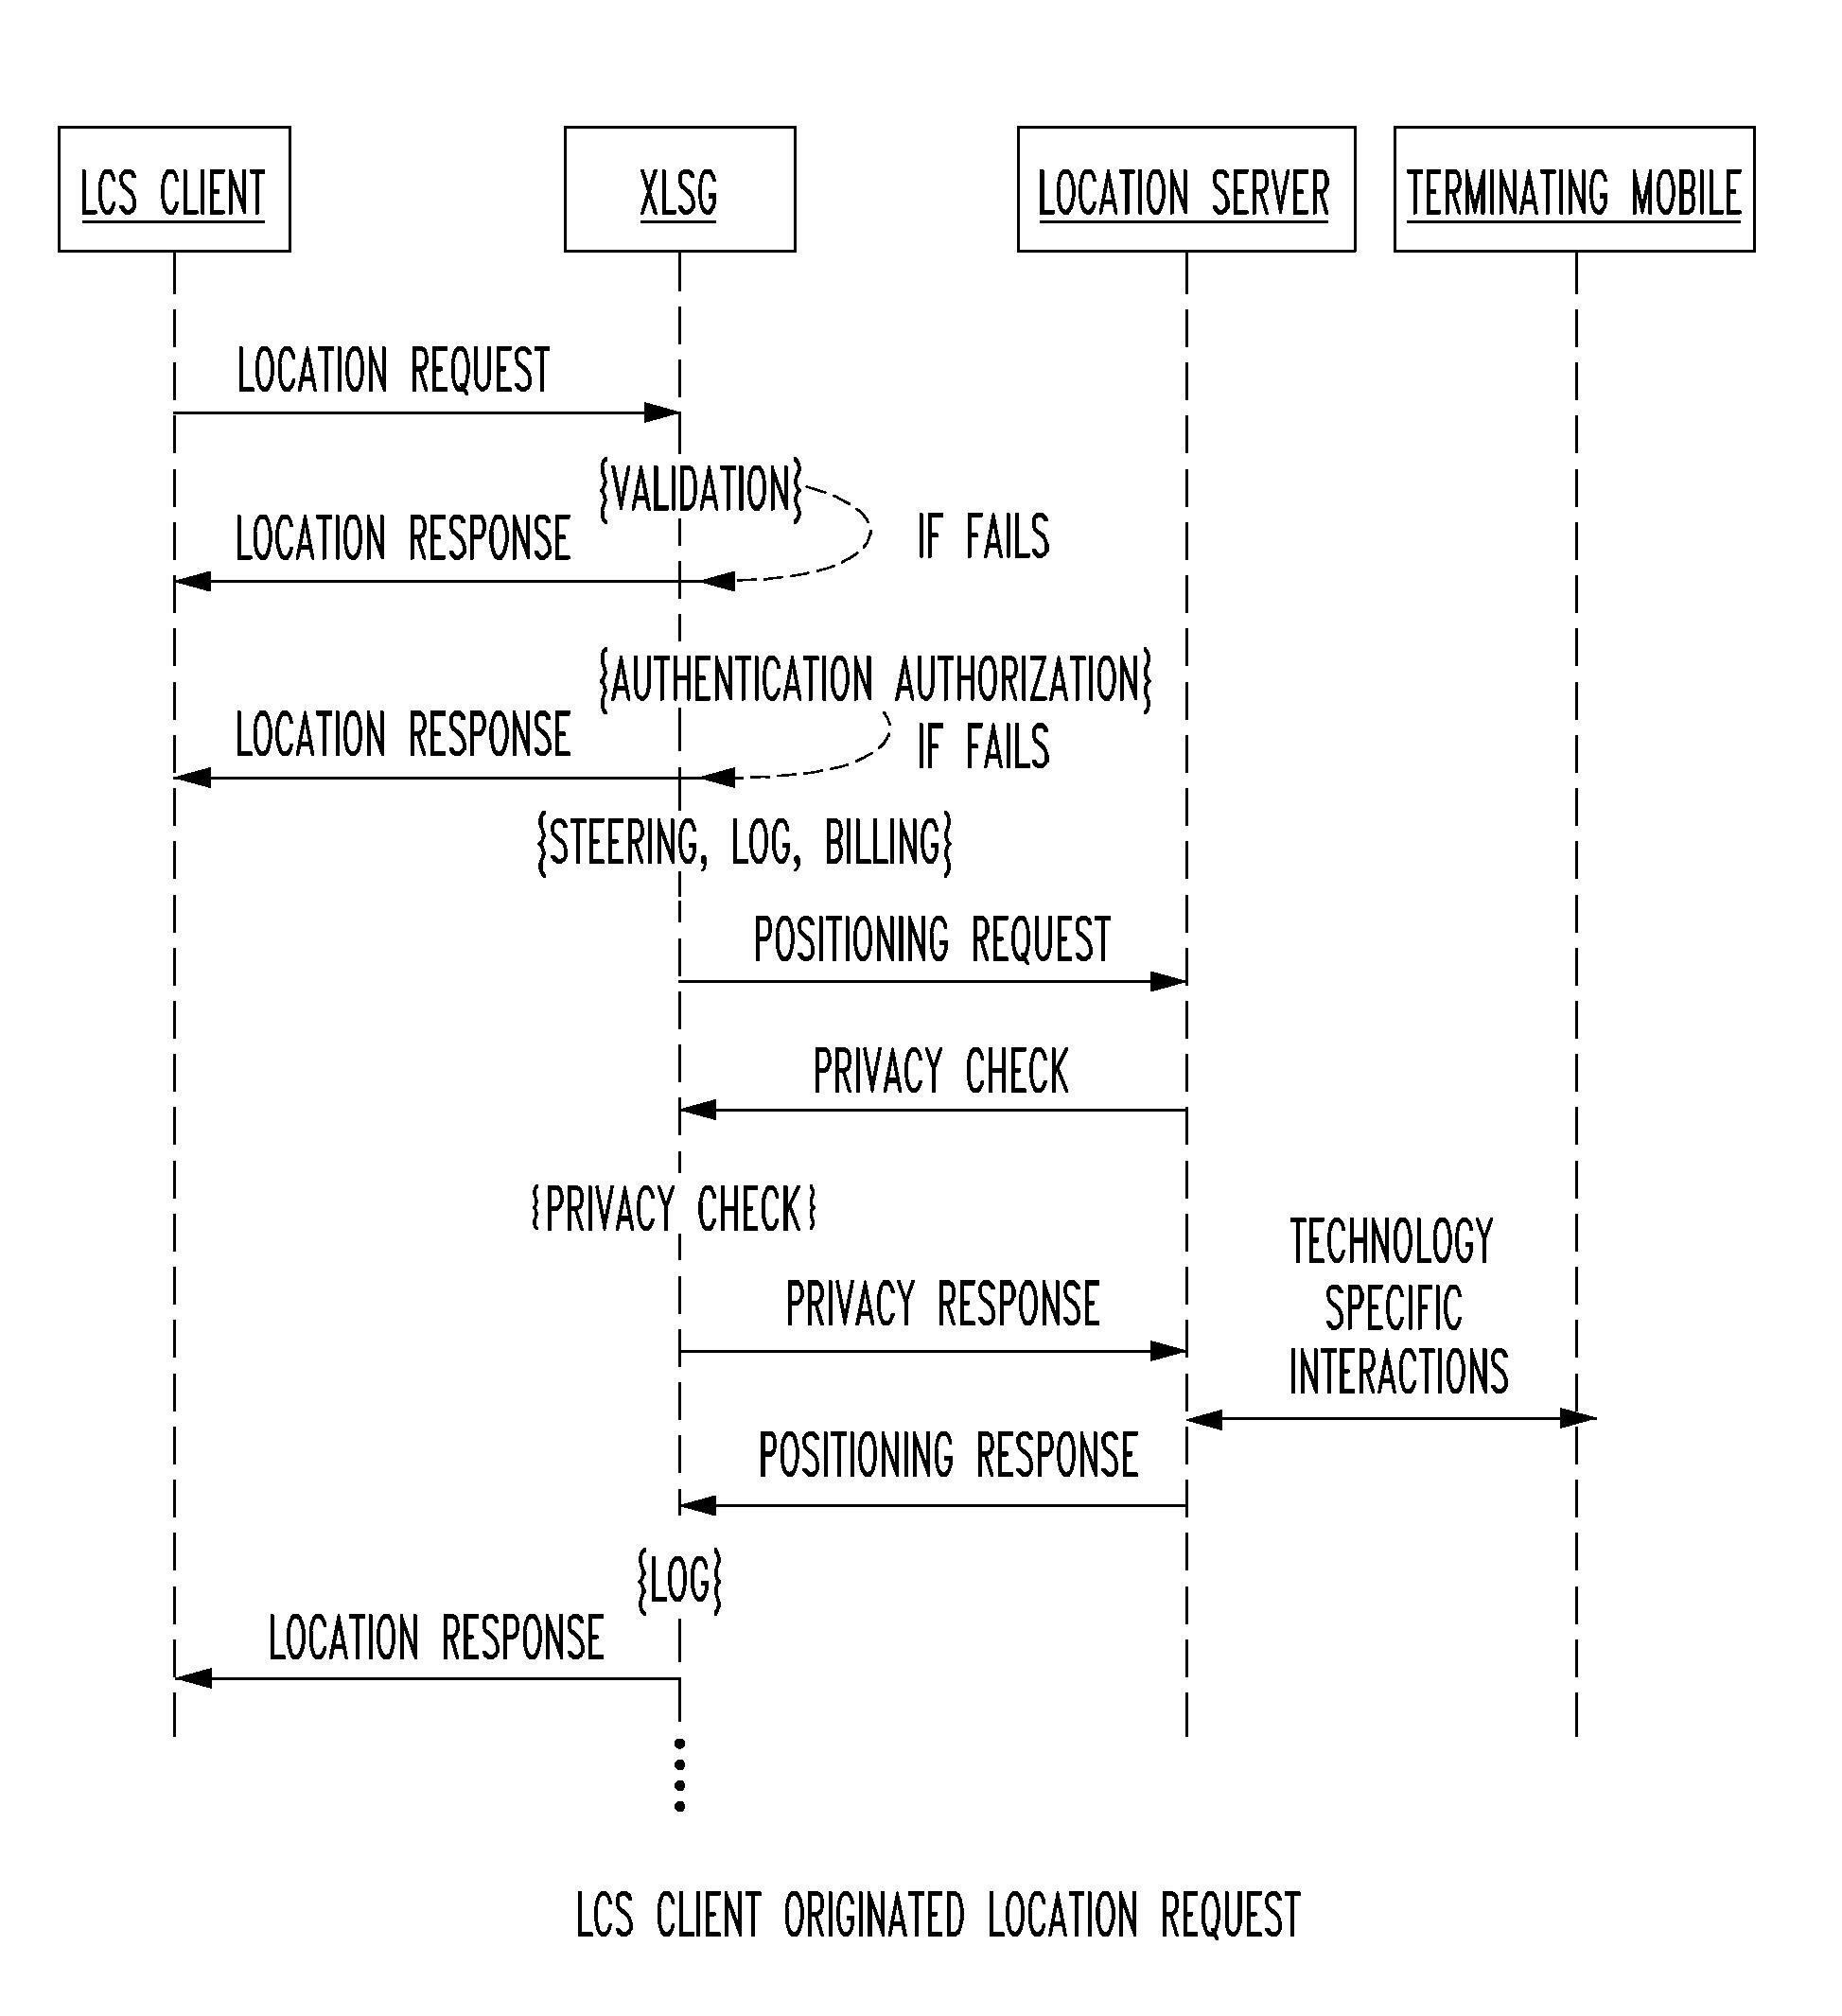 Patent US 9,191,520 B2